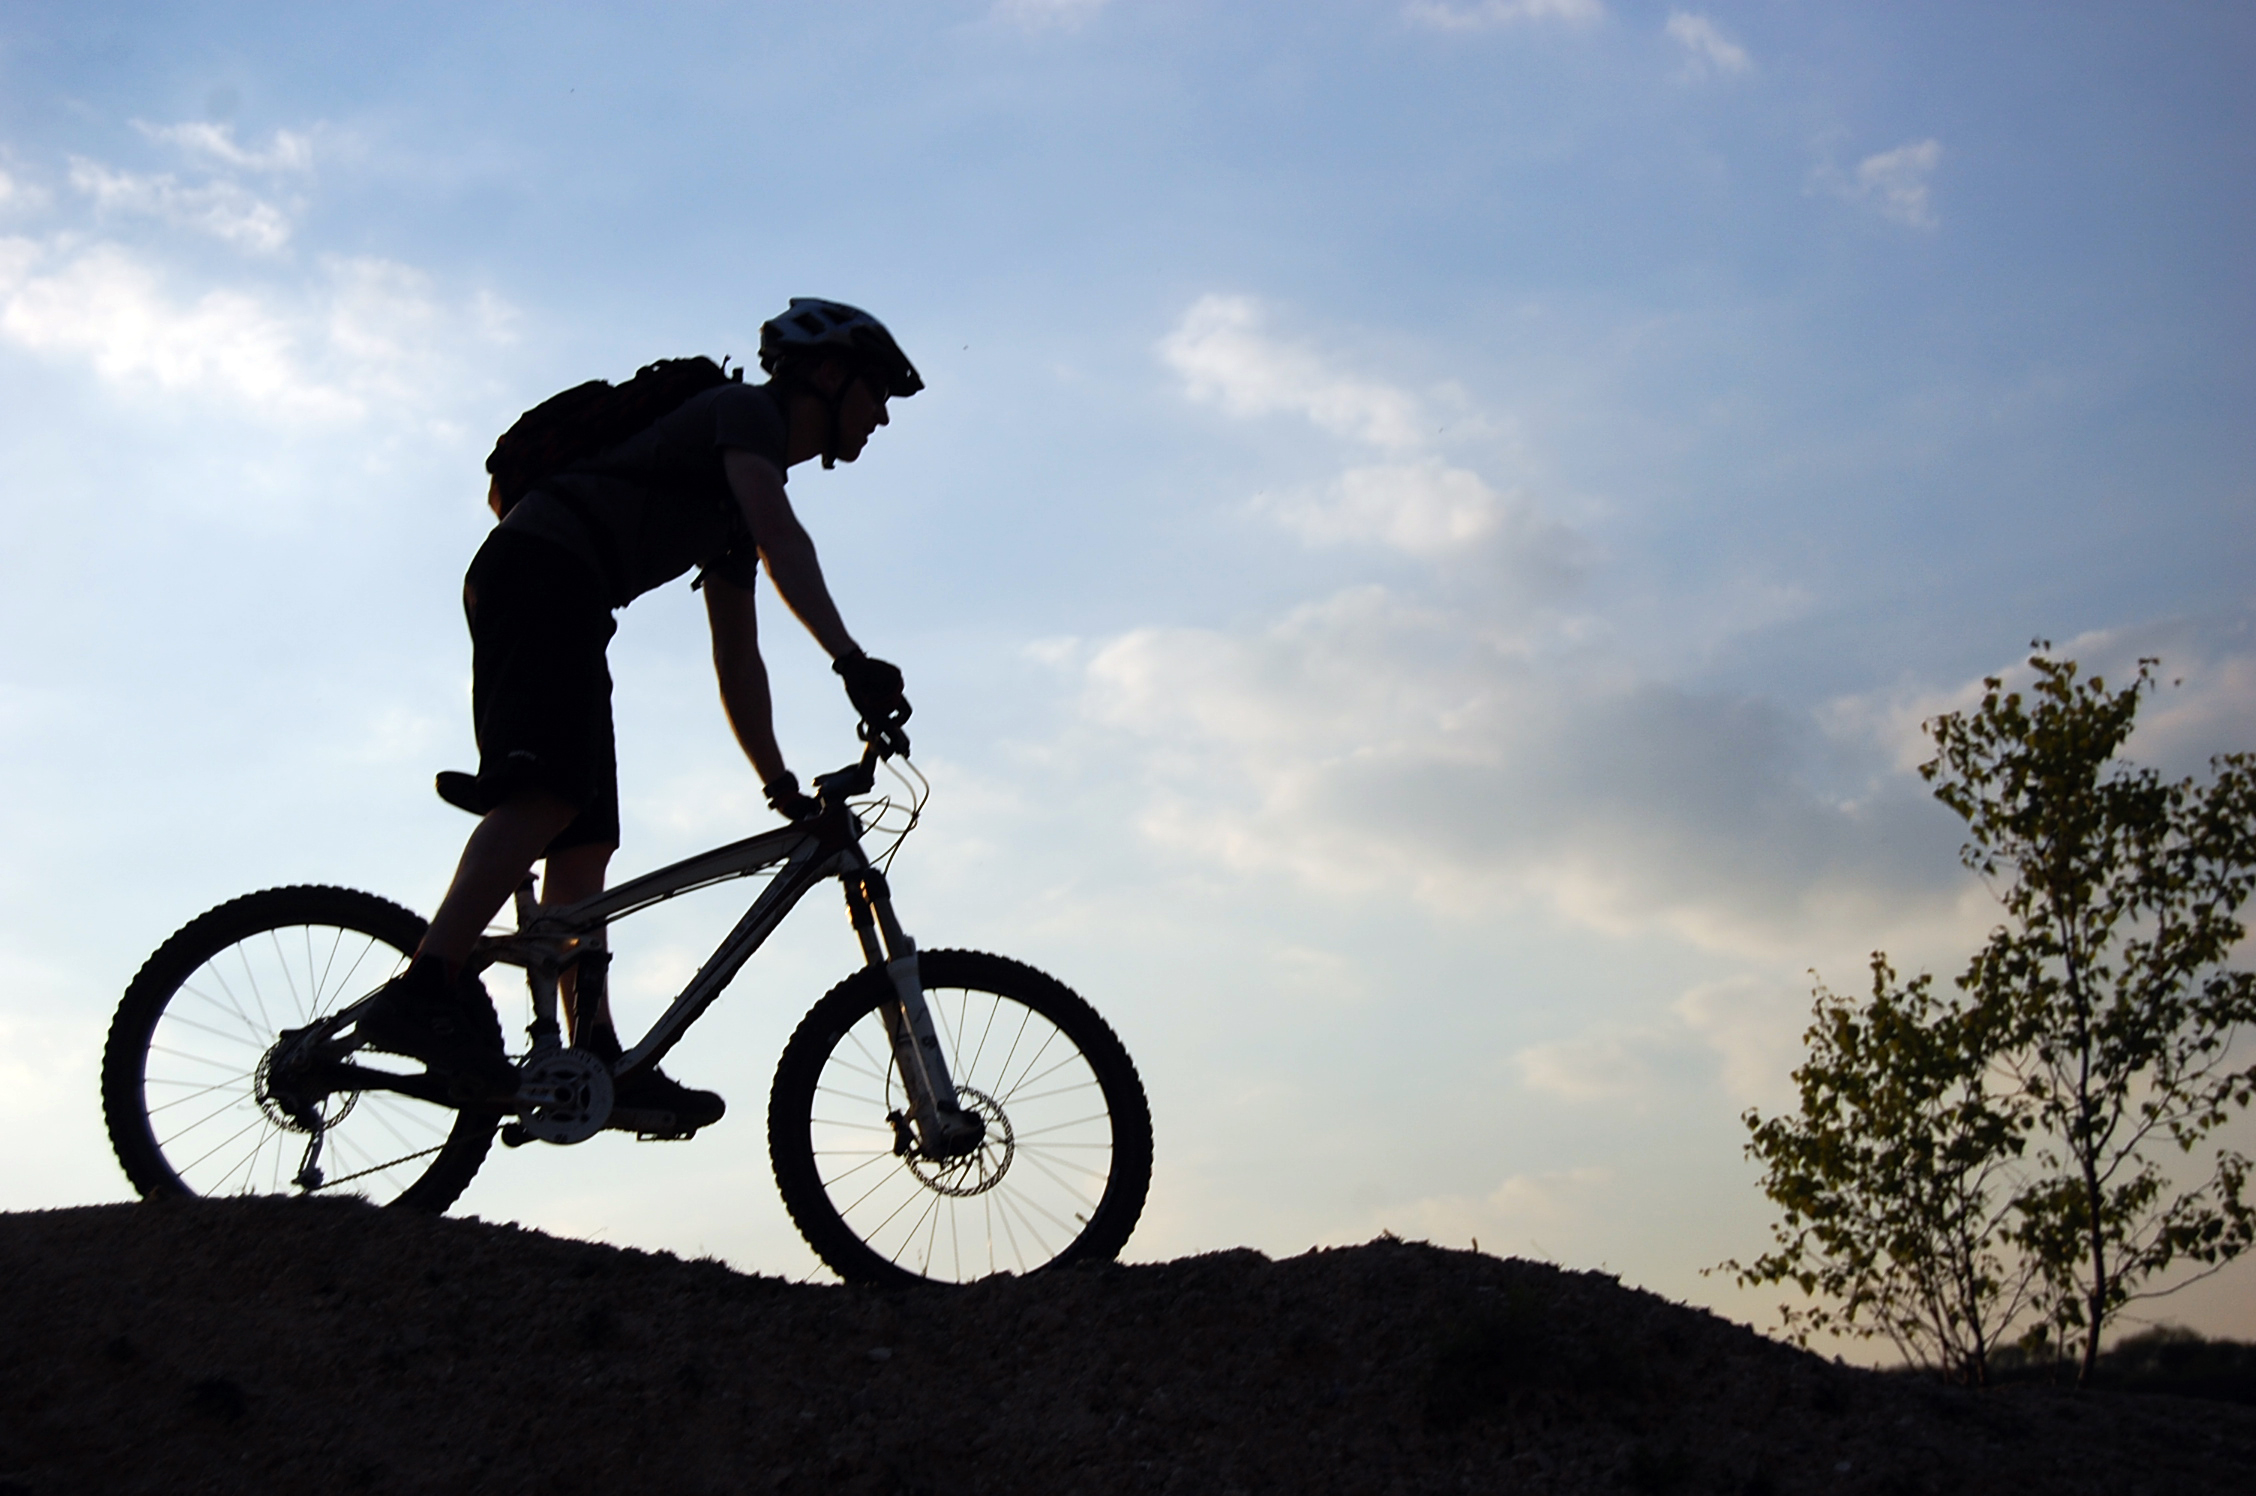 bike ride wallpapers